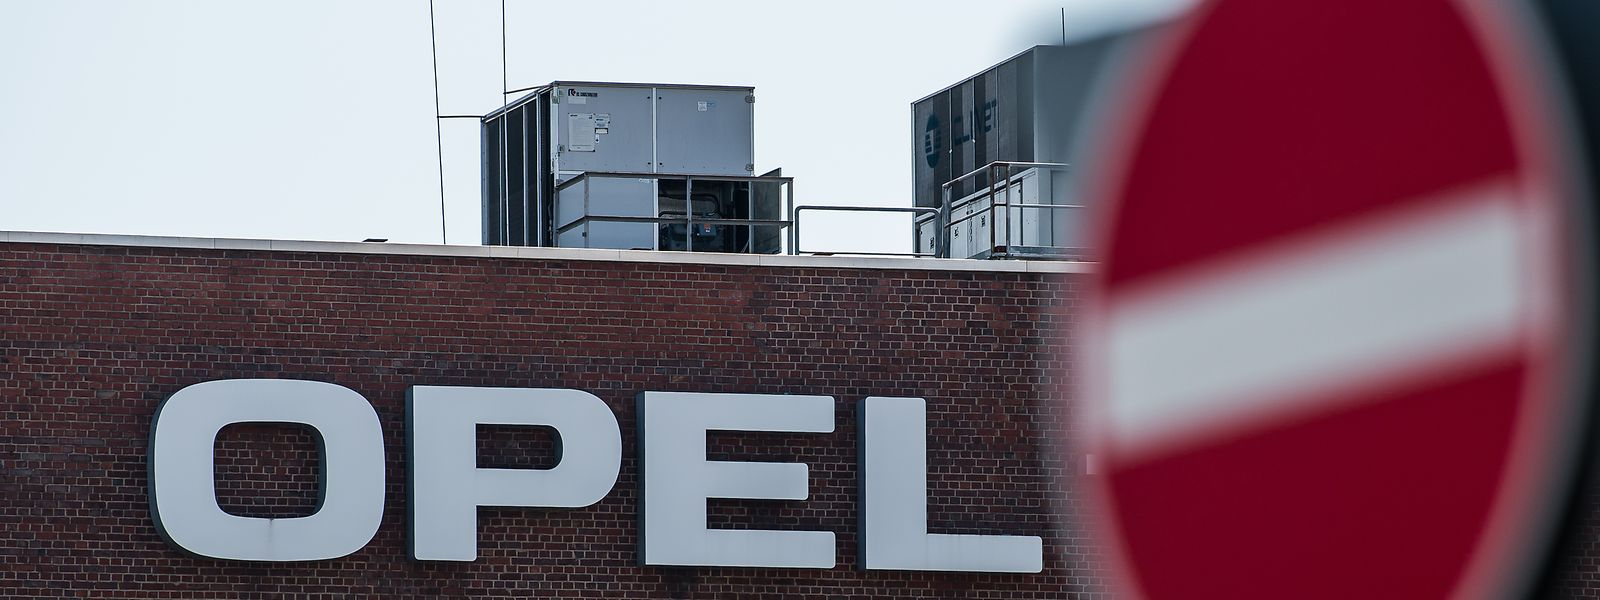 Der Schriftzug «Opel» ist an der Fassade des Opel-Werks in Rüsselsheim zu sehen.